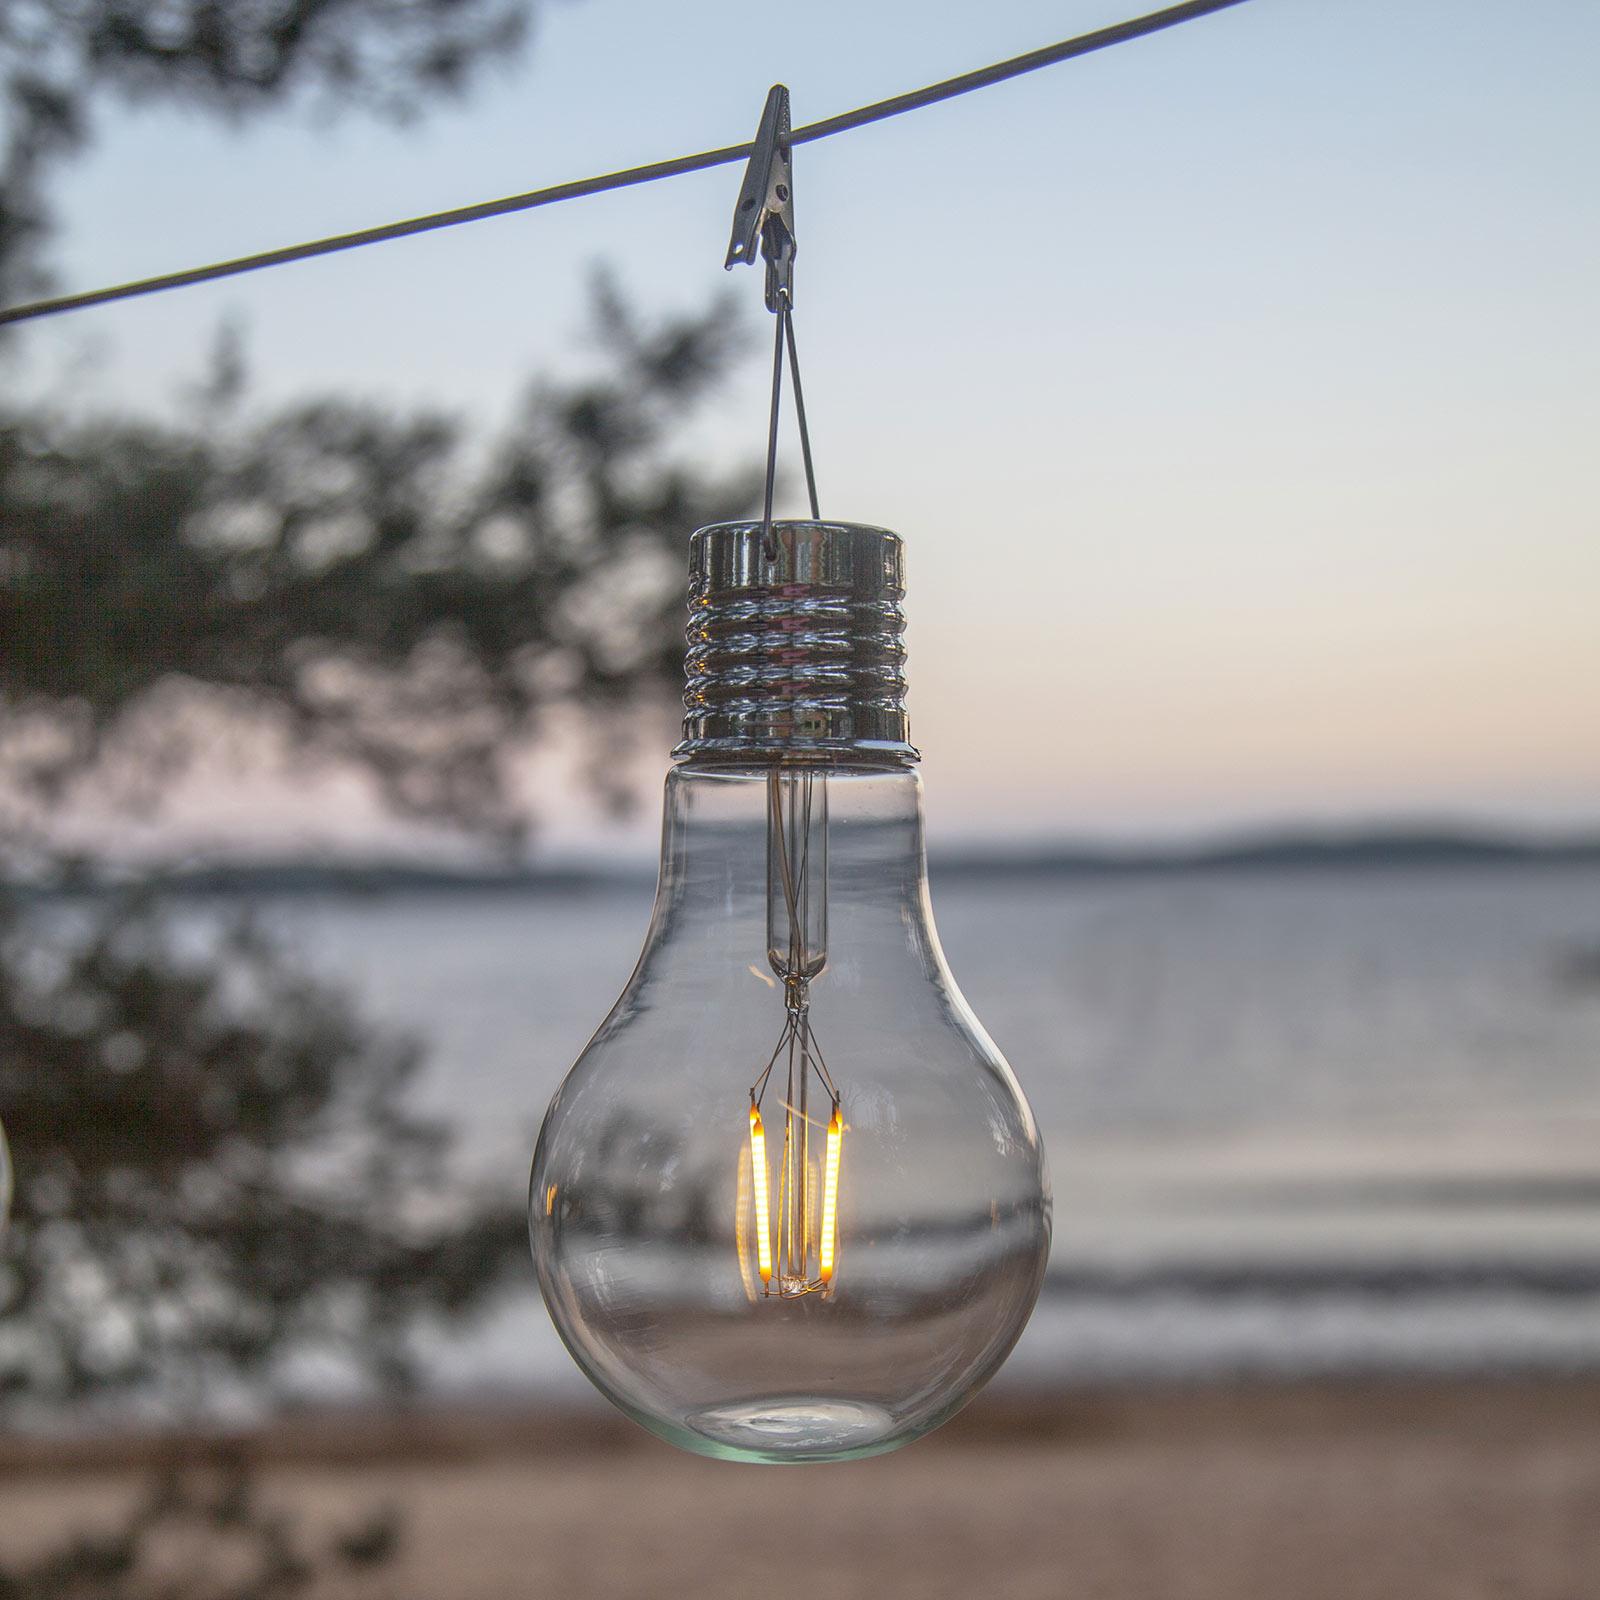 Lampada LED solare Fille, lampada decorativa